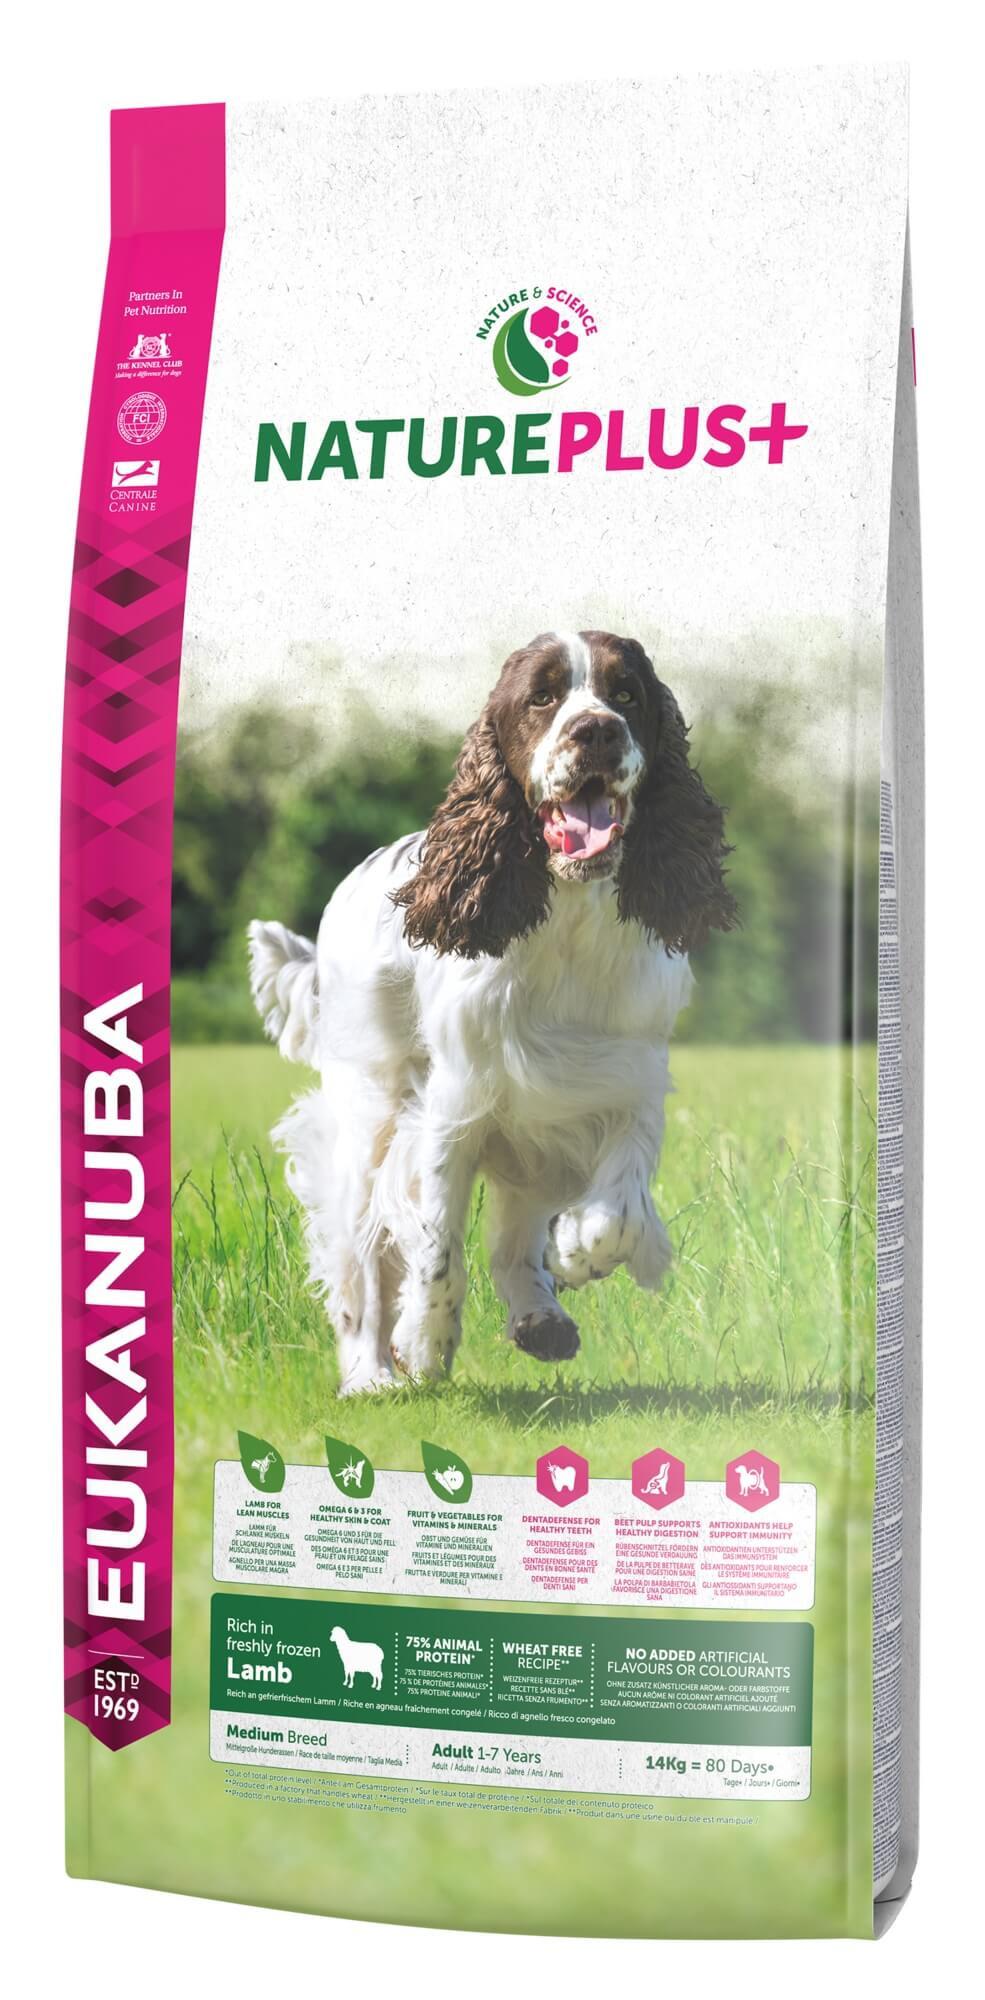 Eukanuba NaturePlus+ Adult Medium Breed Lam hondenvoer